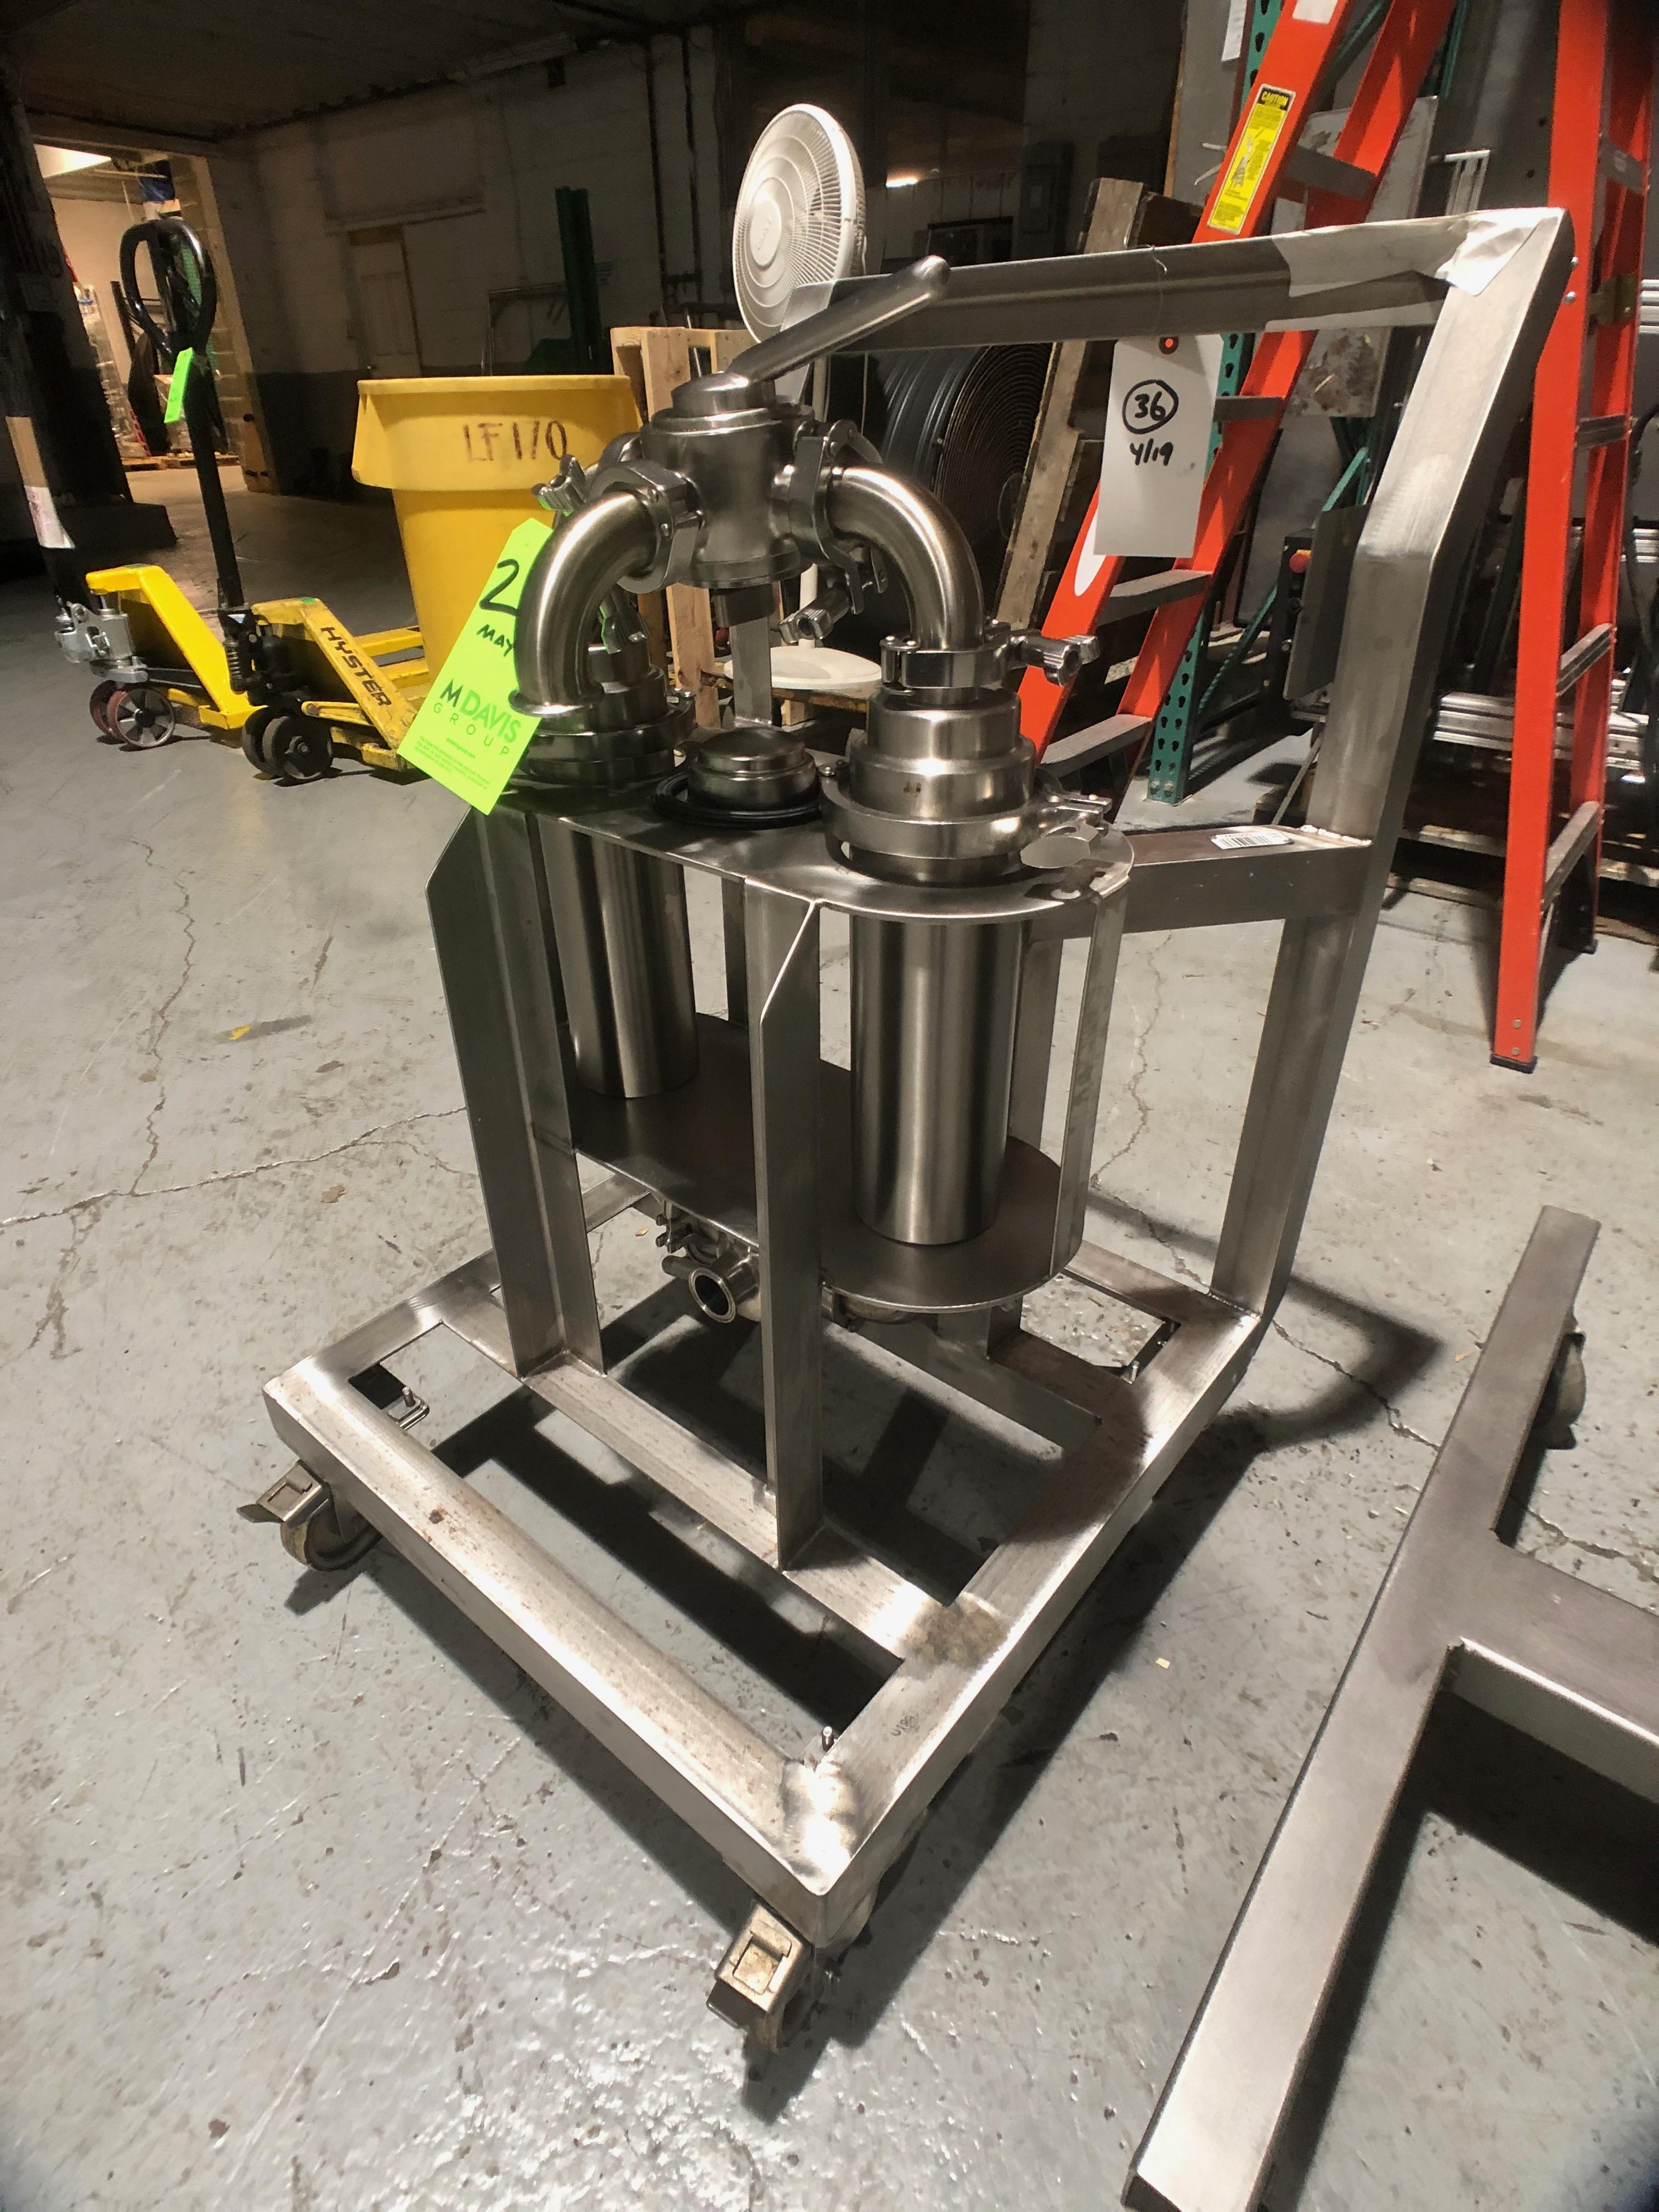 Lot 20 - Beacon Metal Fabricators Inc Portable Duplex Inline S/S Filter System, (2) Inline Filters & (2) 3-